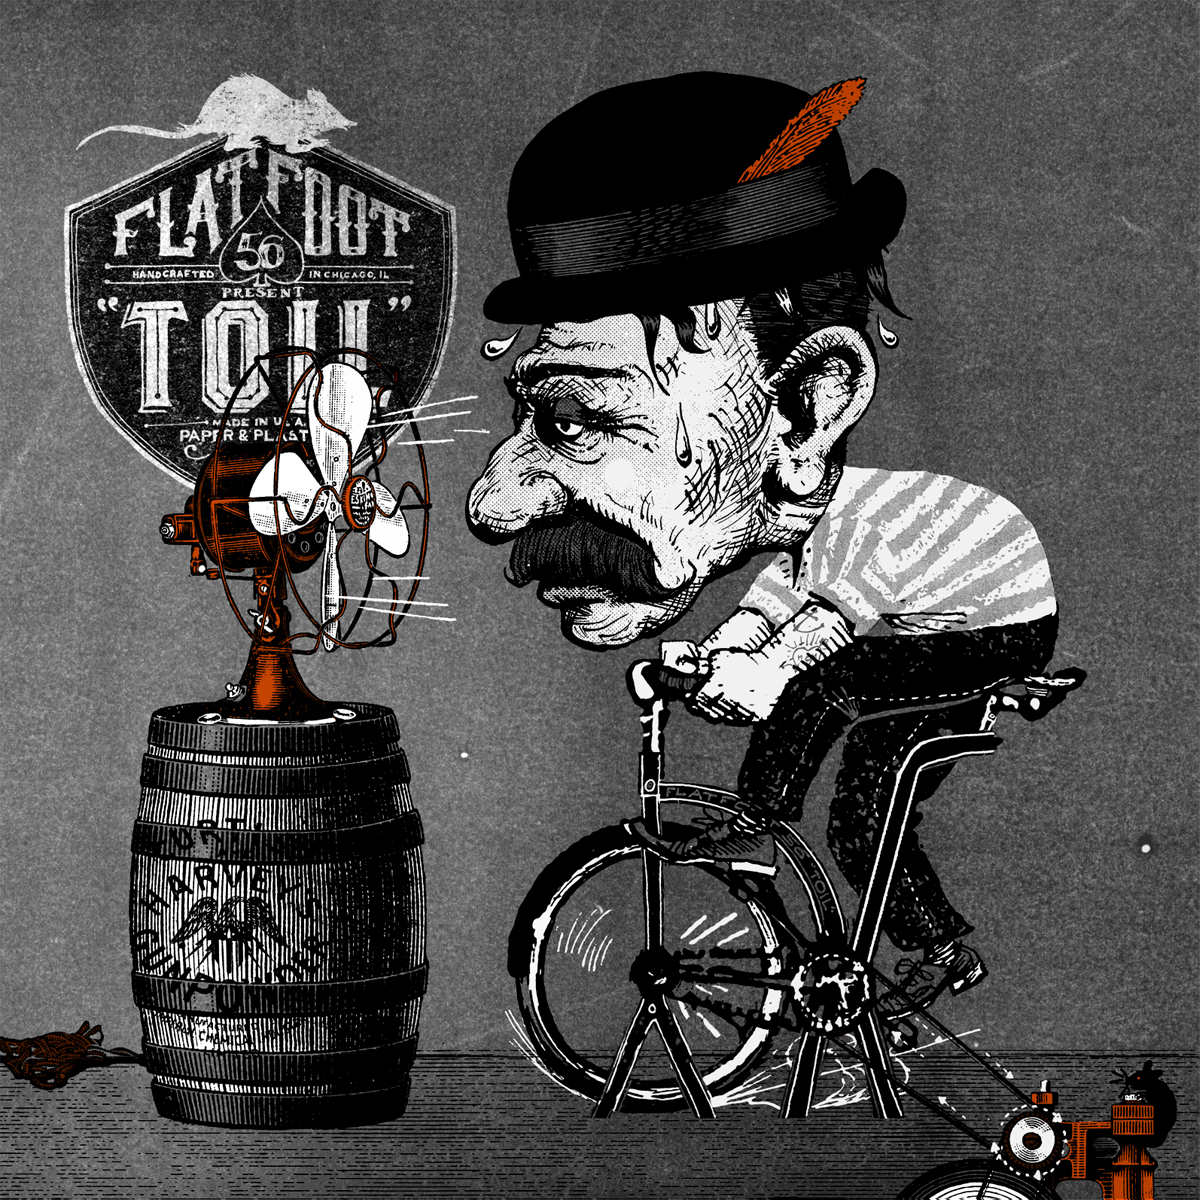 Flatfoot 56 - Toil 12